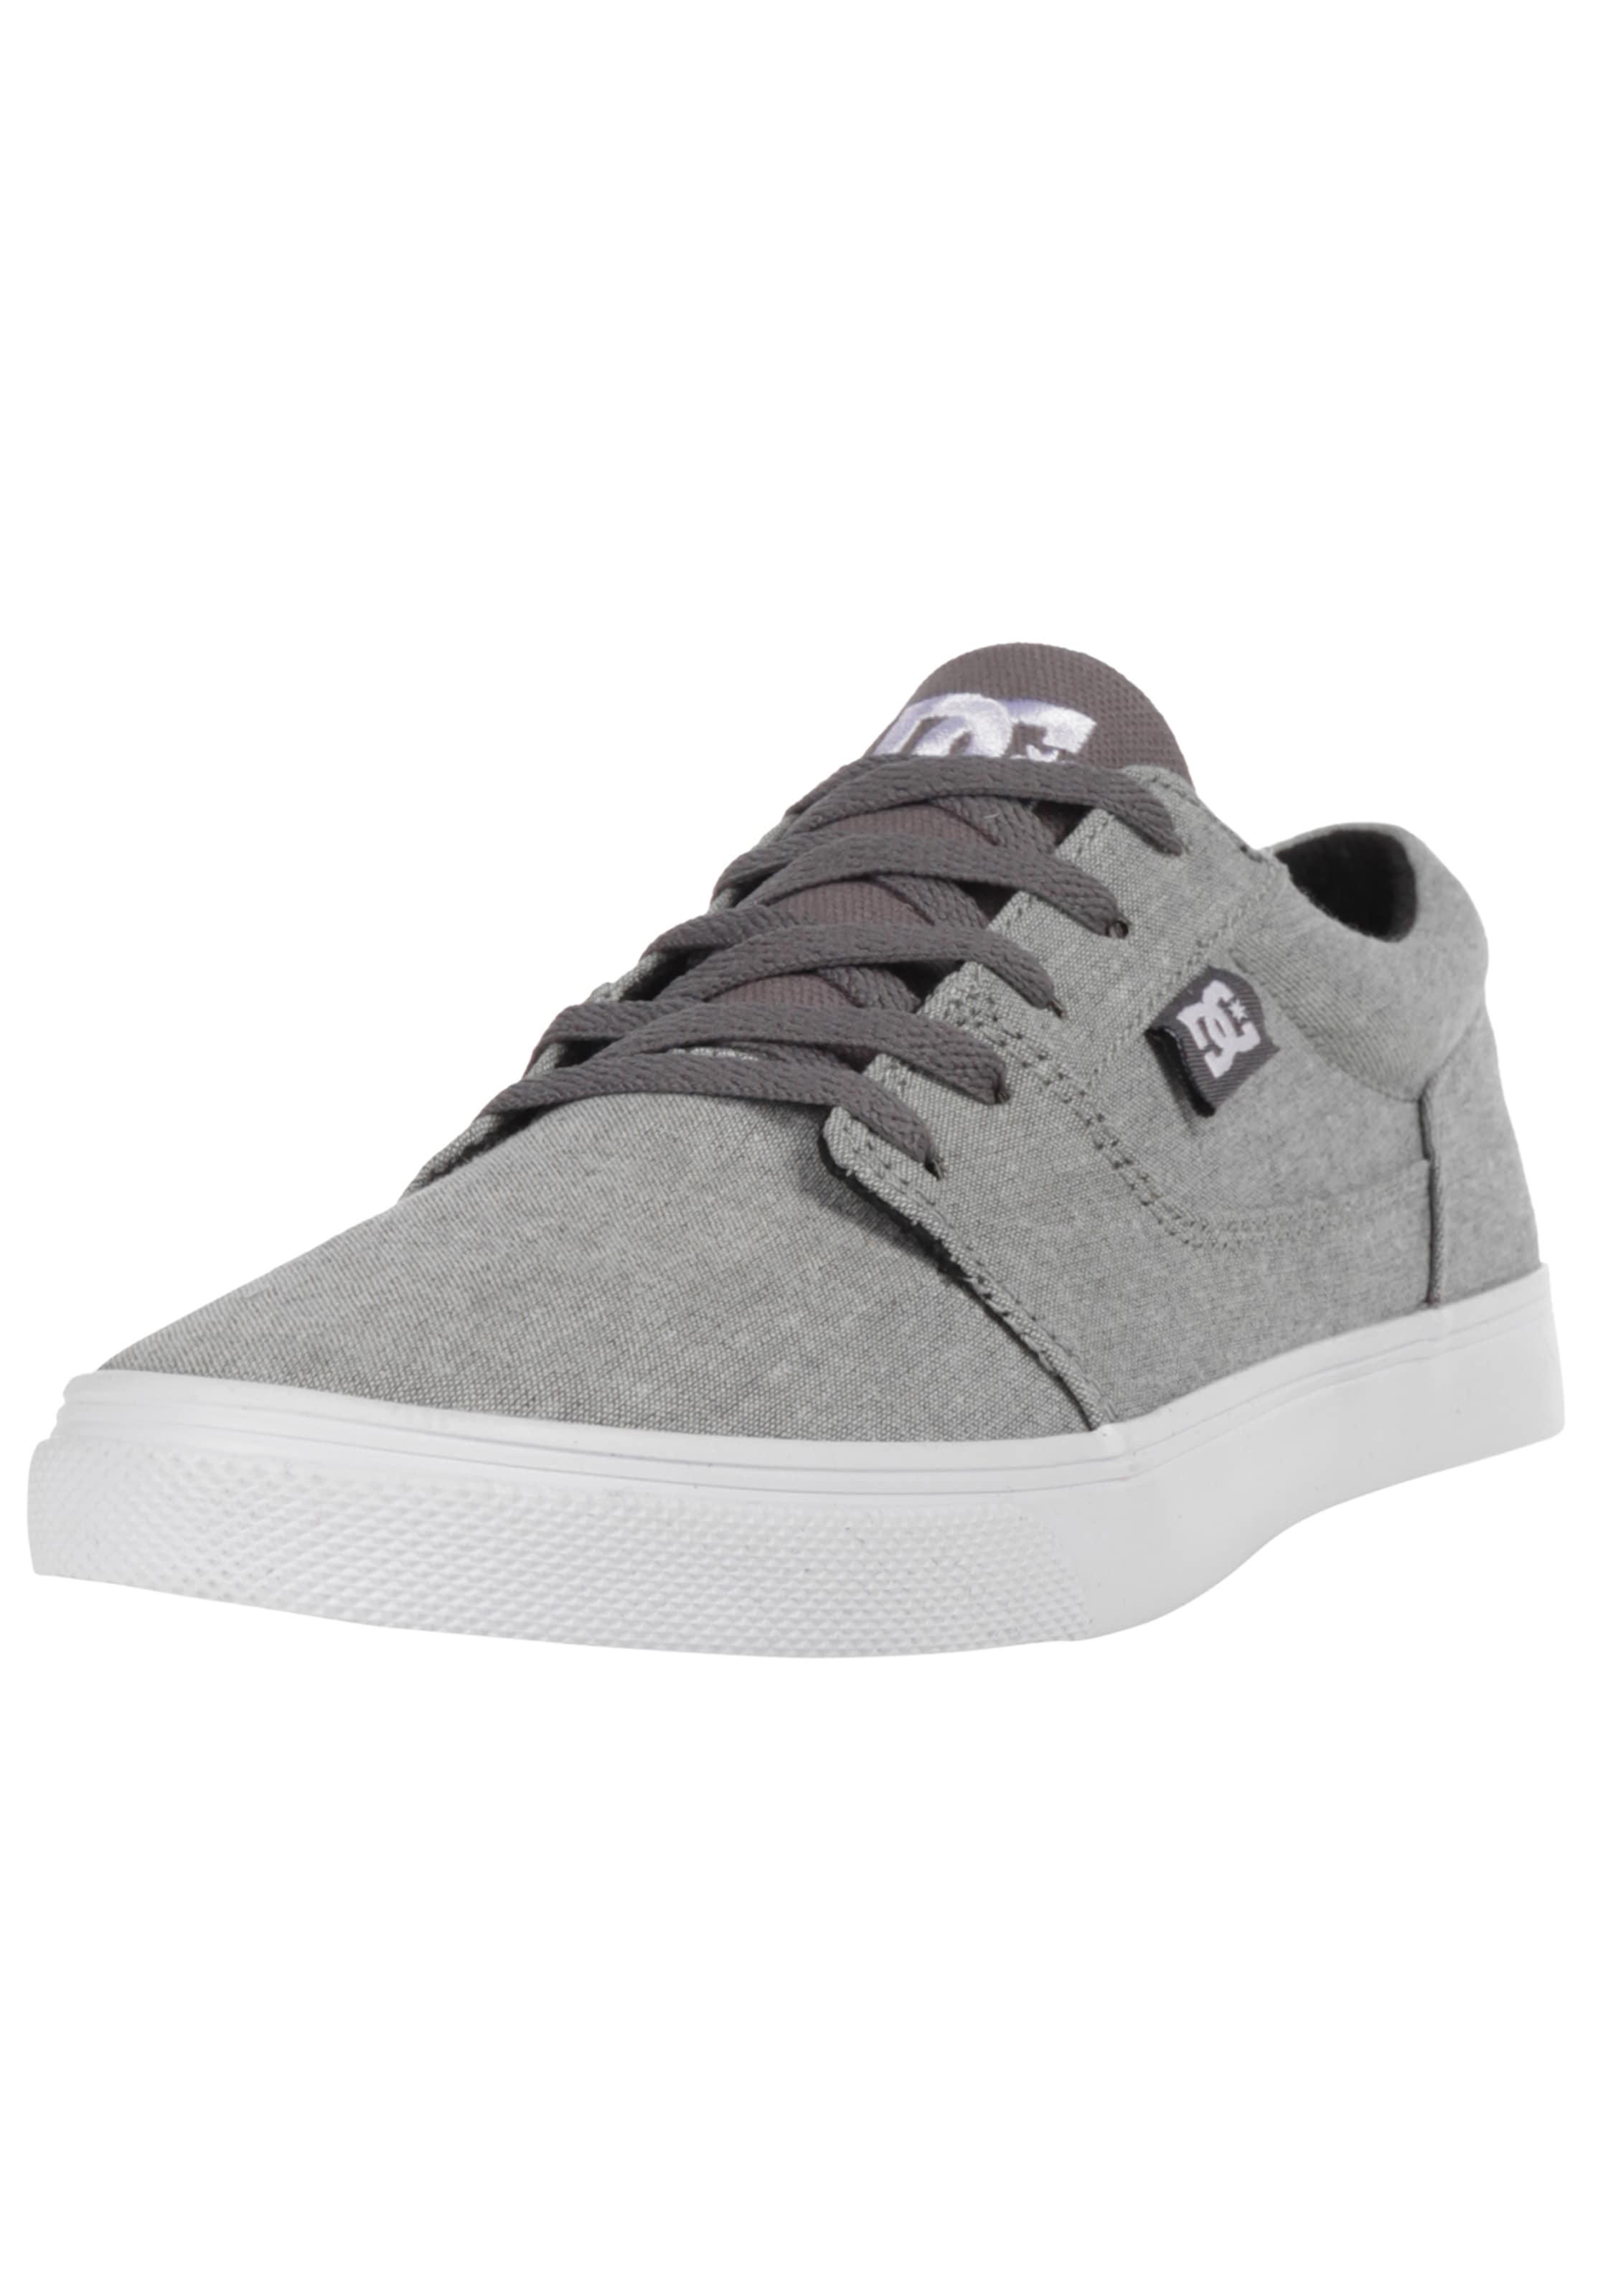 Tx' 'tonik GrauTaupe Sneaker Shoes Dc In rdQhCst